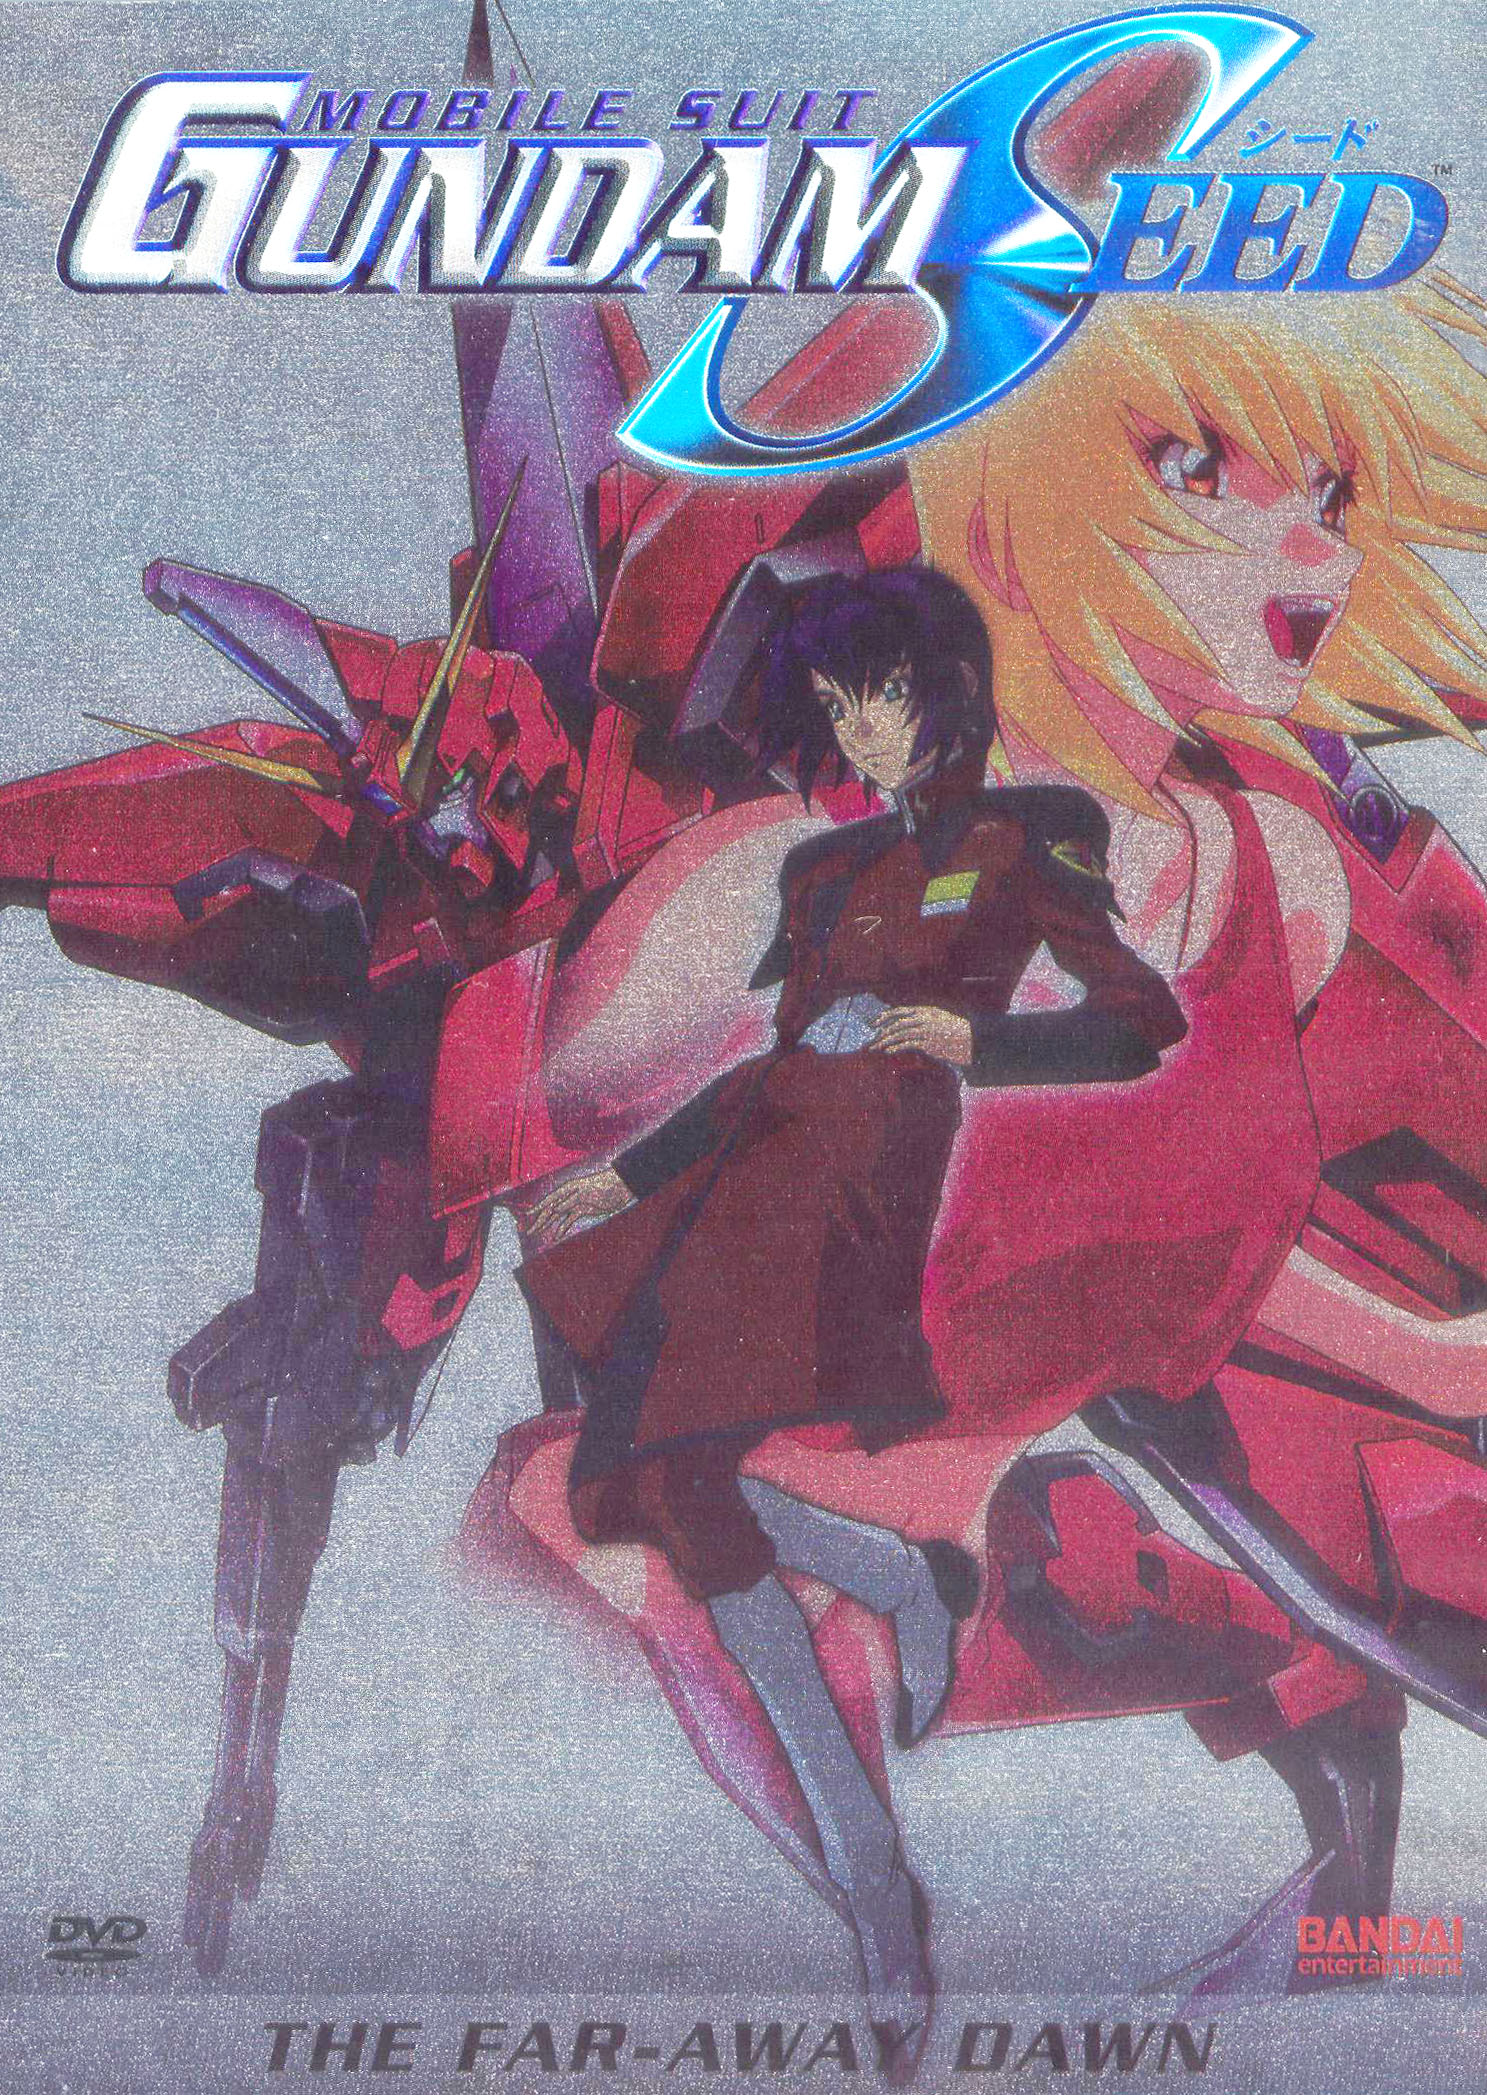 Mobile Suit Gundam SEED: The Far-Away Dawn